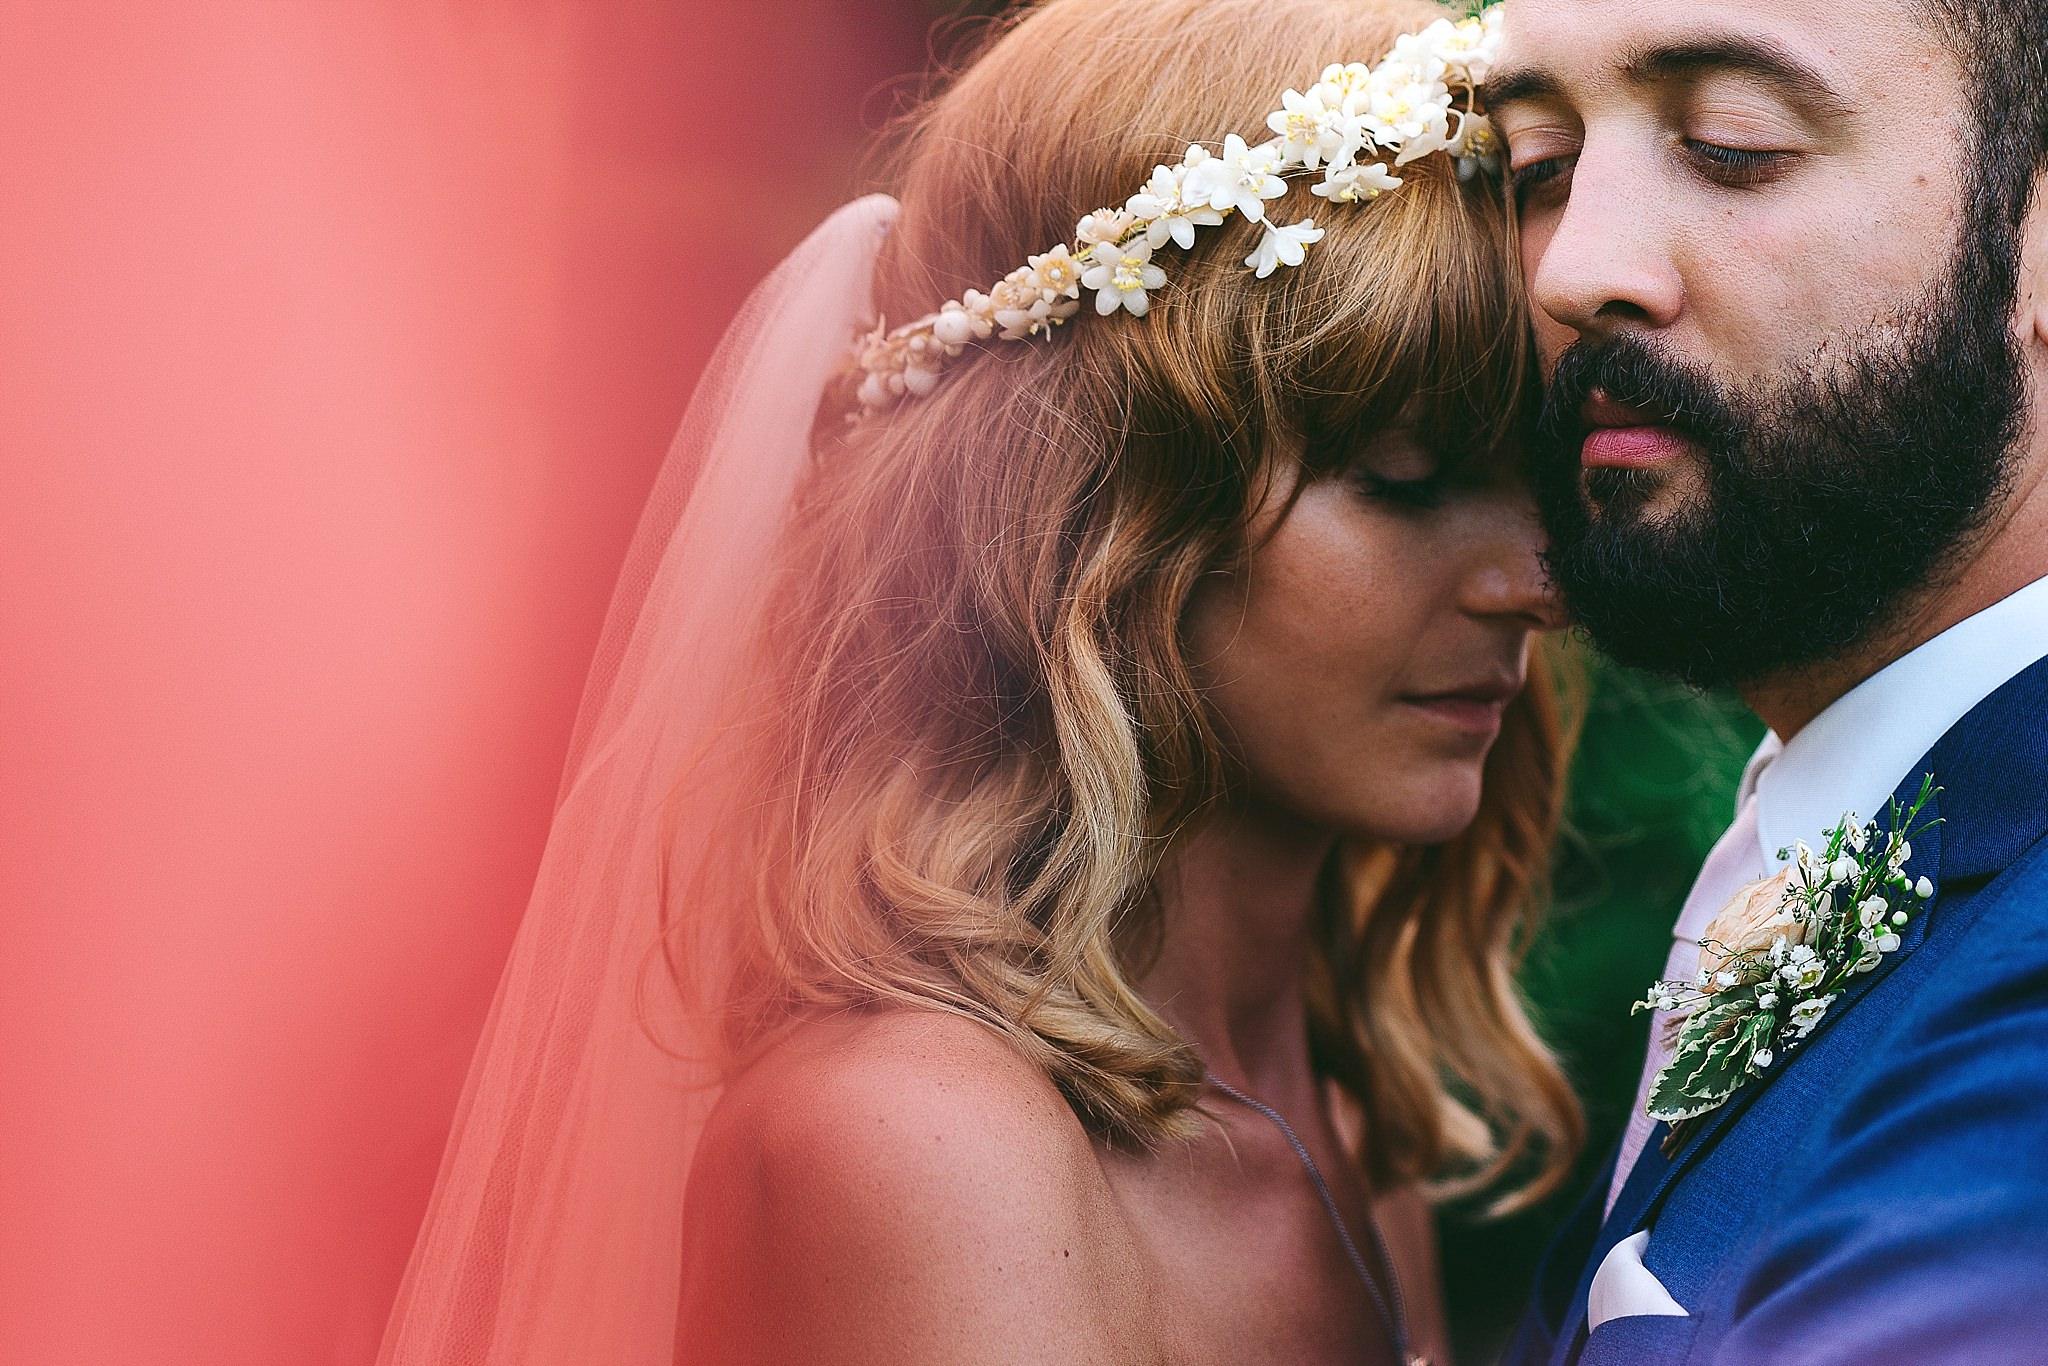 aga-tomaszek-wedding-photographer-cardiff-2016_1069